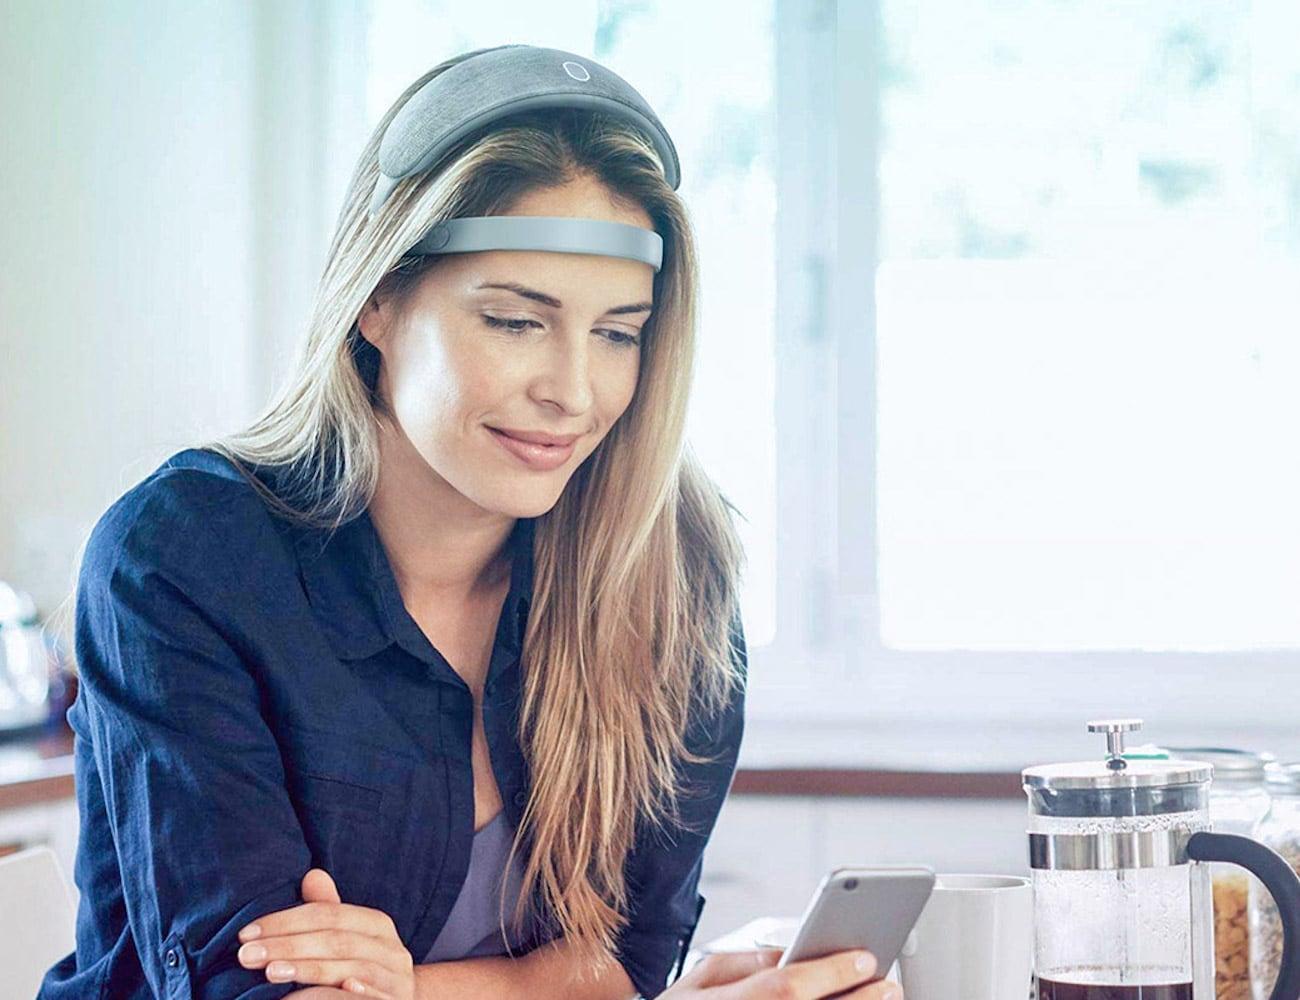 URGONight Brain Sleep Trainer teaches your brain how to sleep deeply